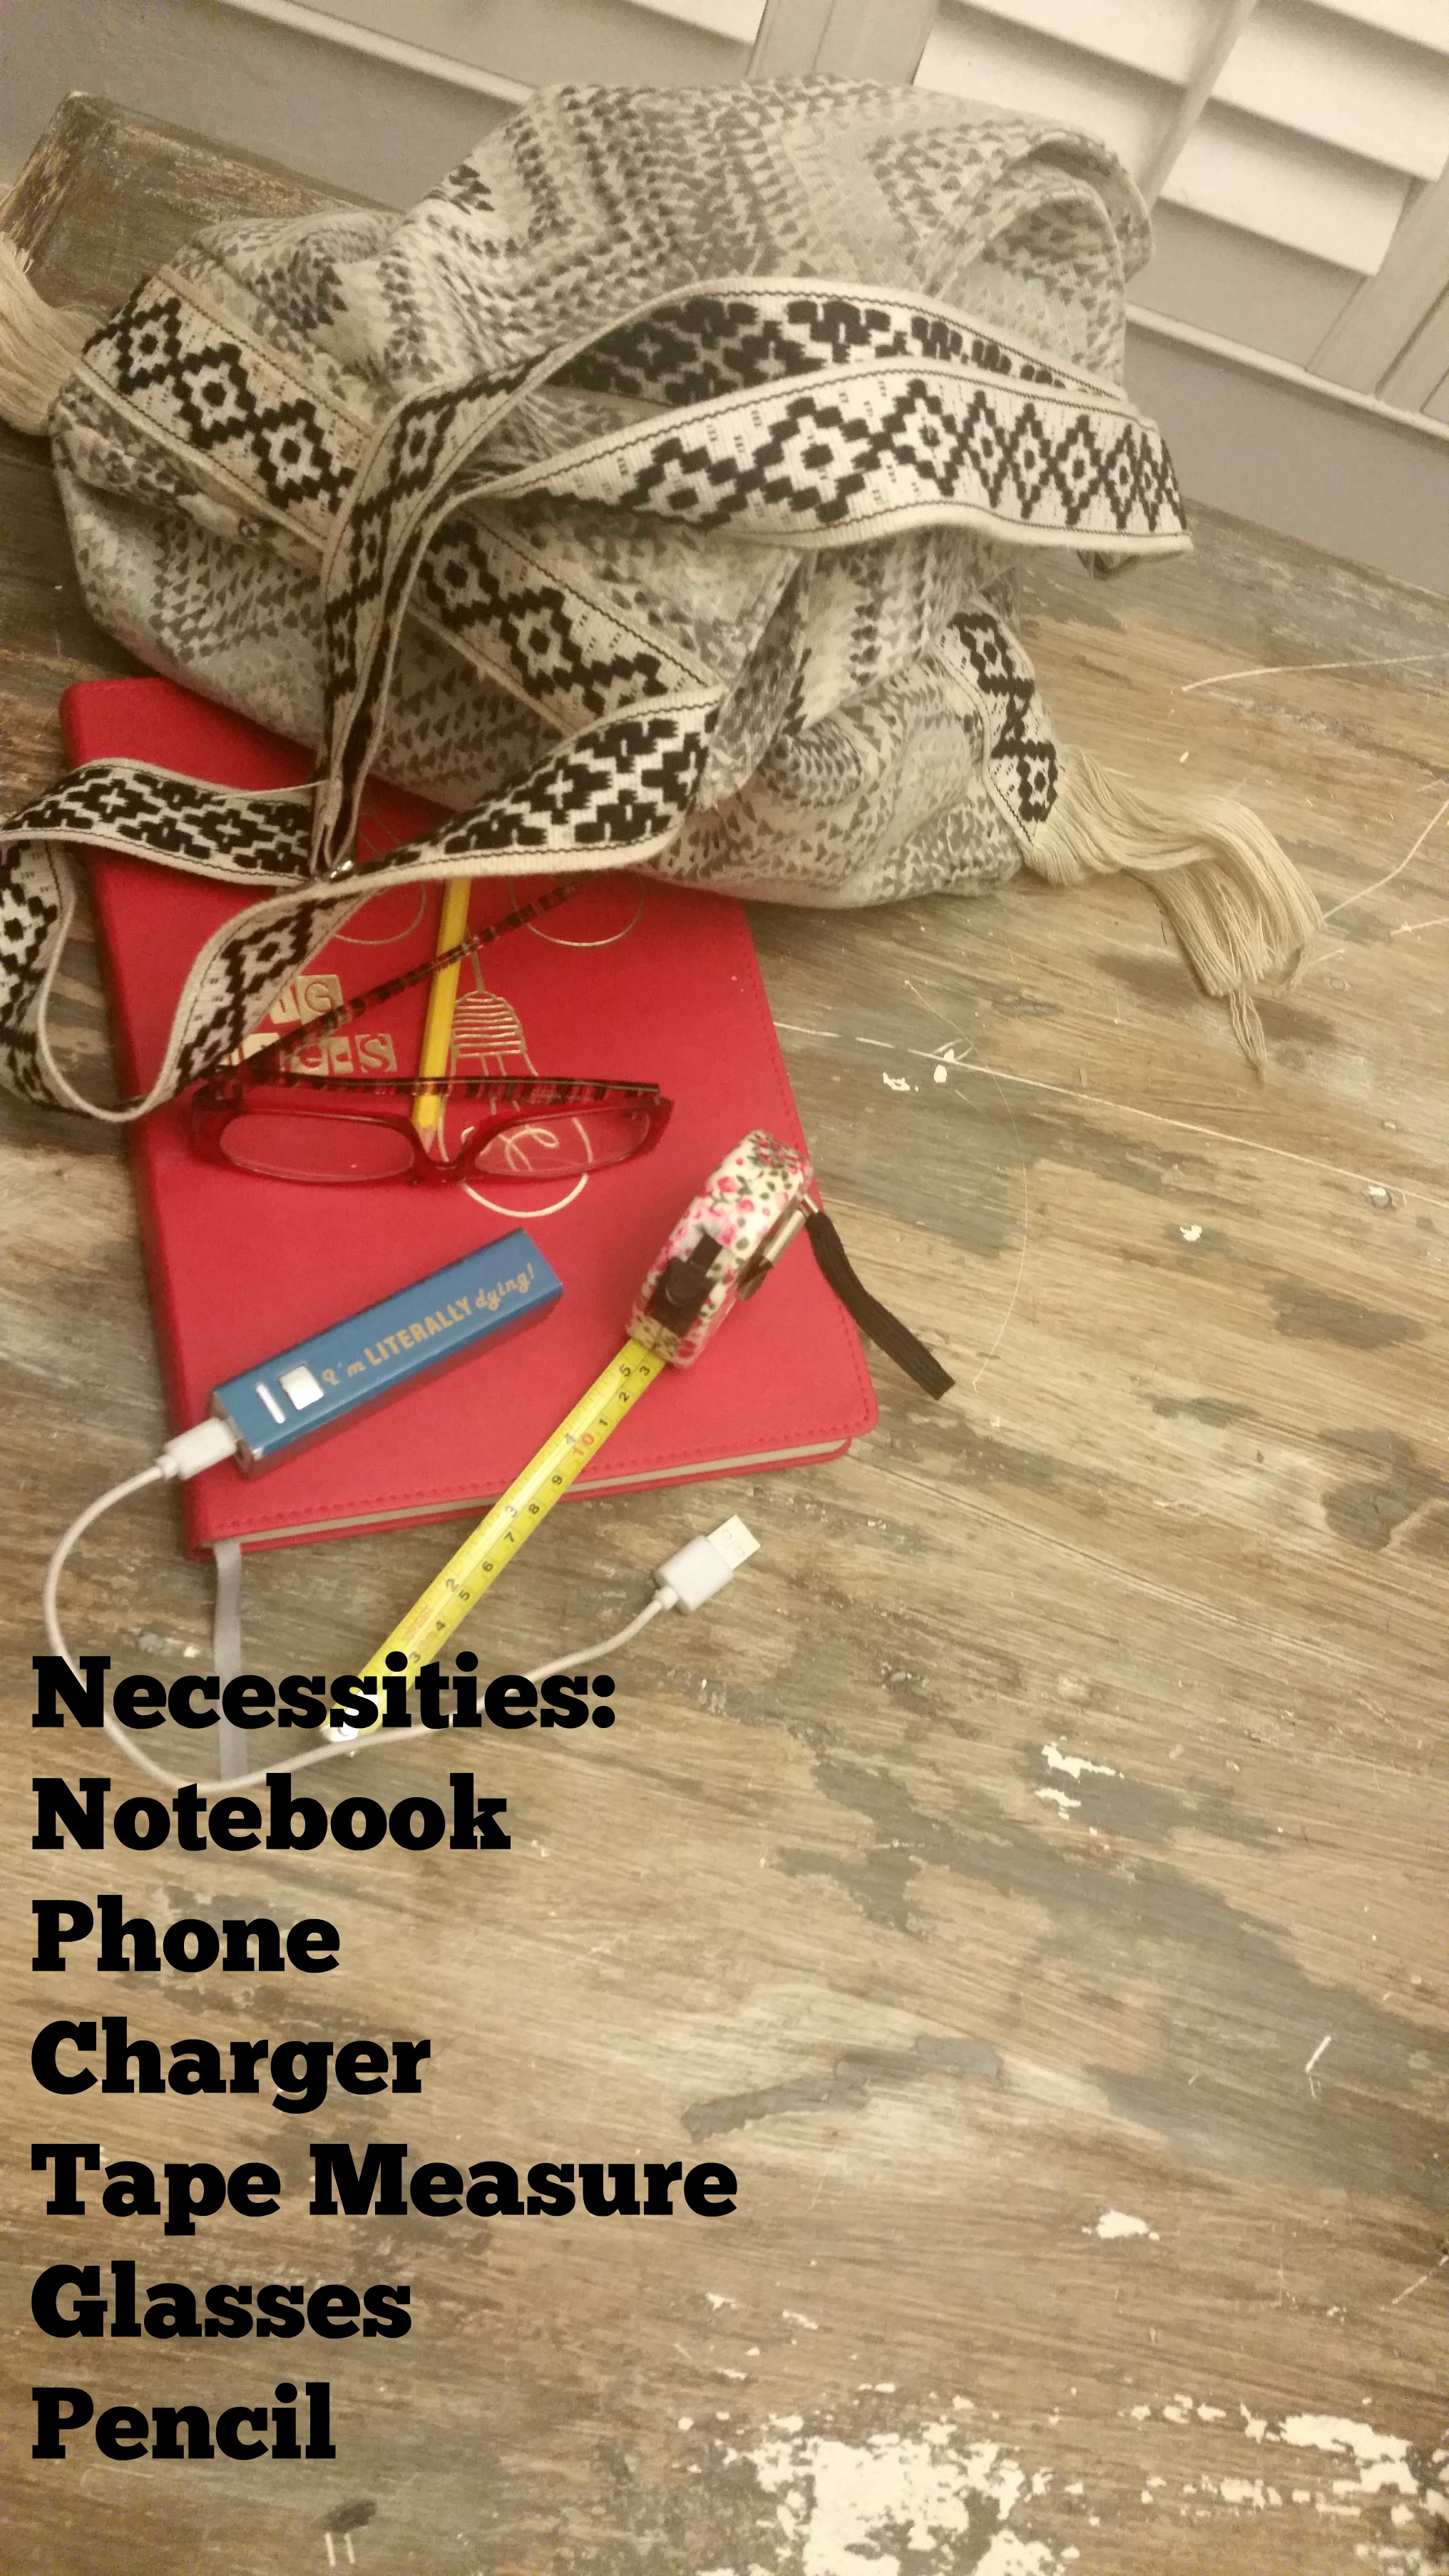 thrift necessities.jpg